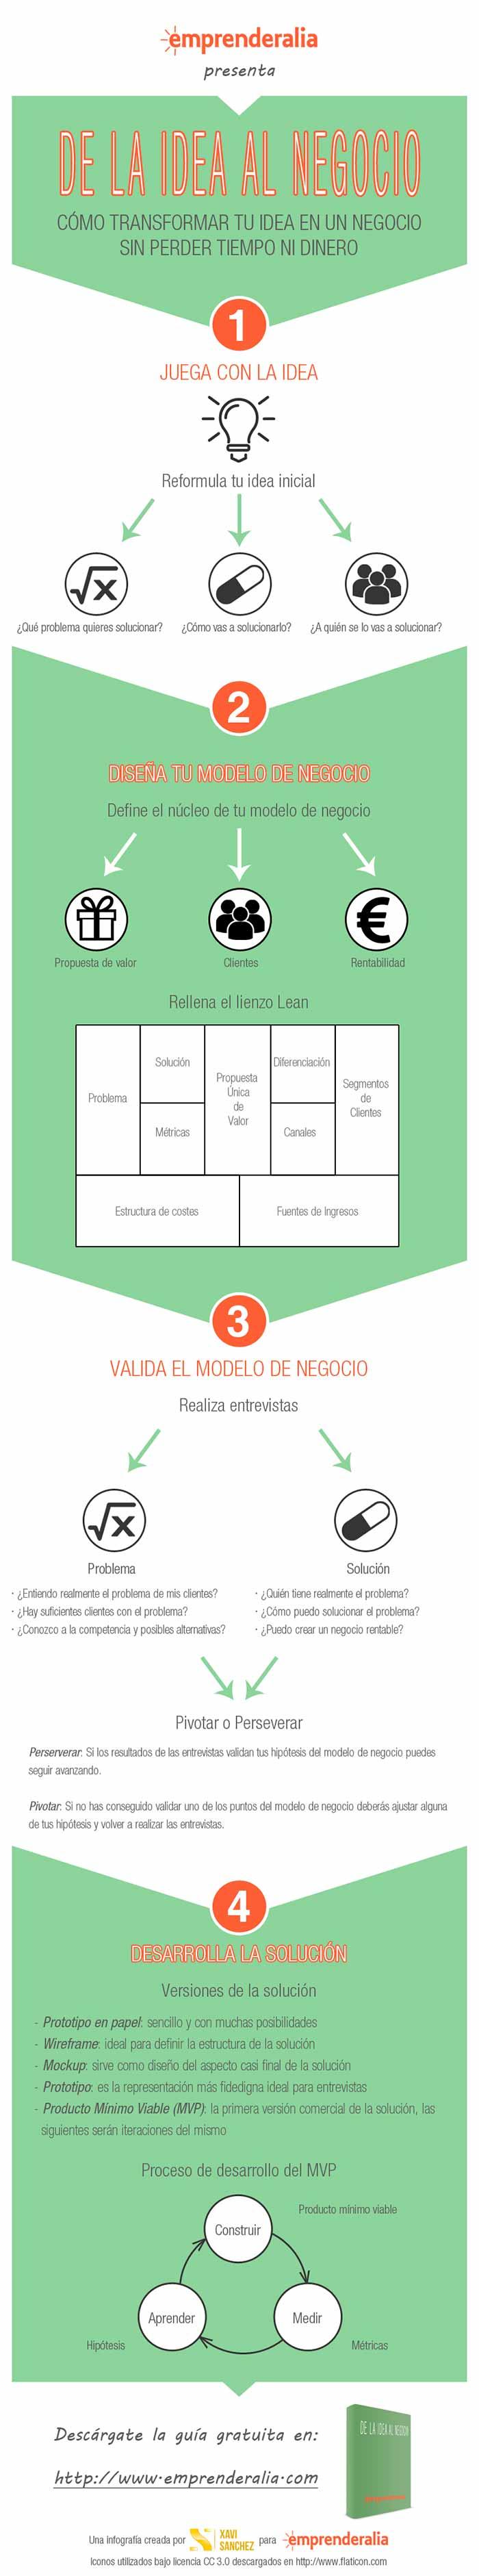 Infografia sobre como transformar tu idea en un negocio